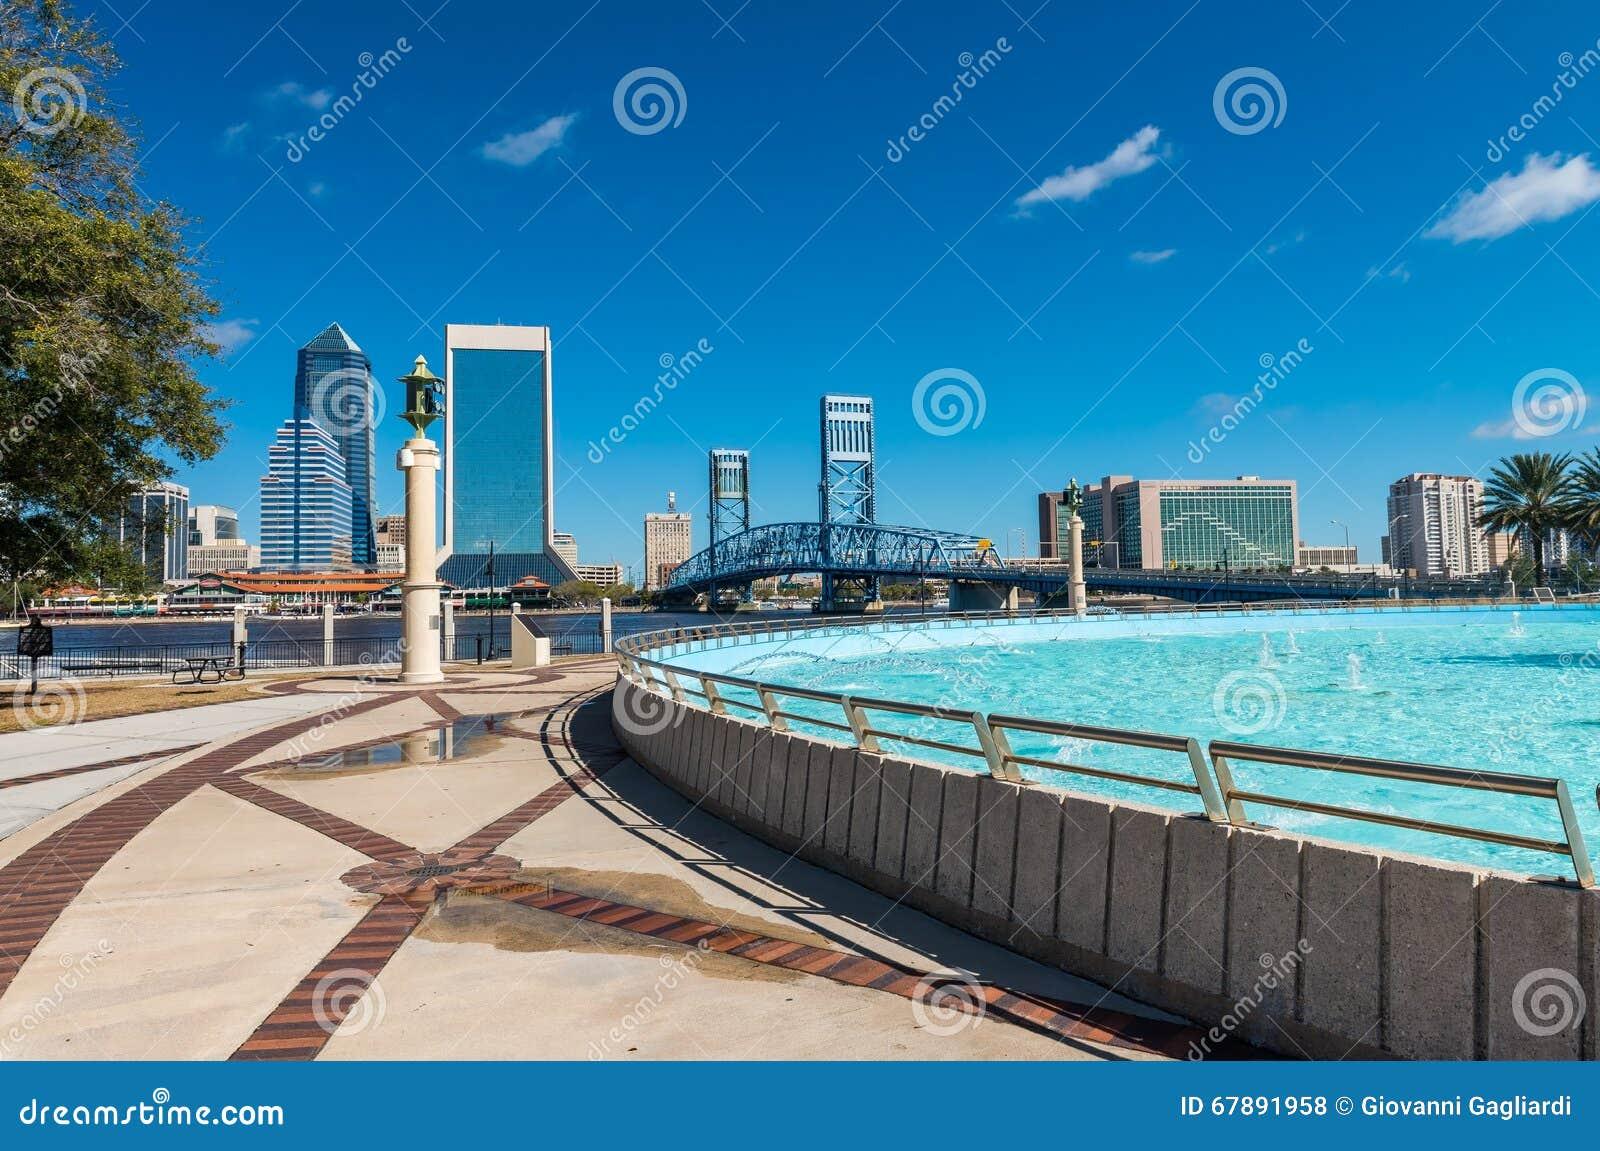 Jacksonville skyline and fountain, Florida